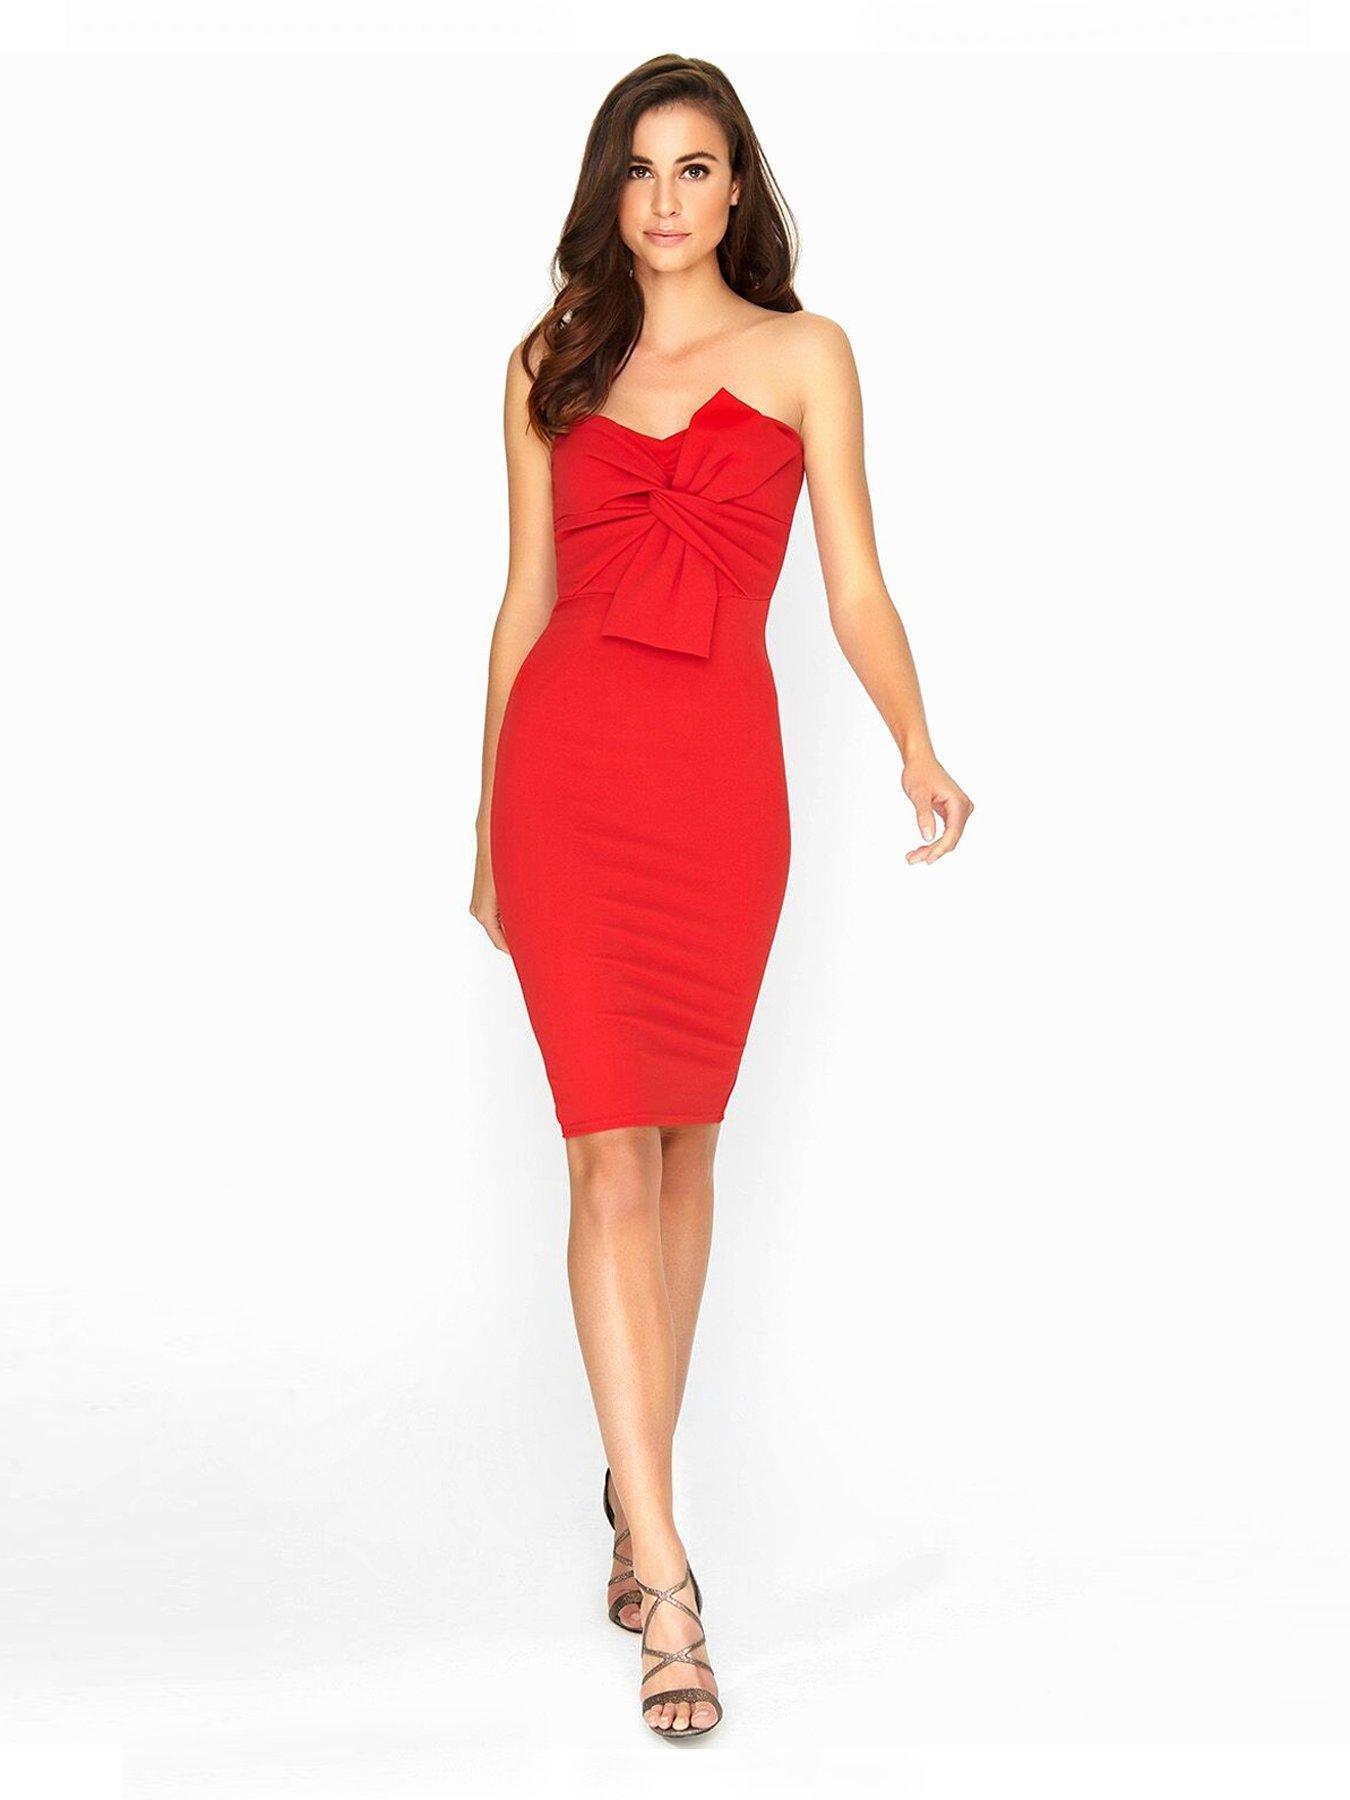 SHARRON: Red boob tube dresses